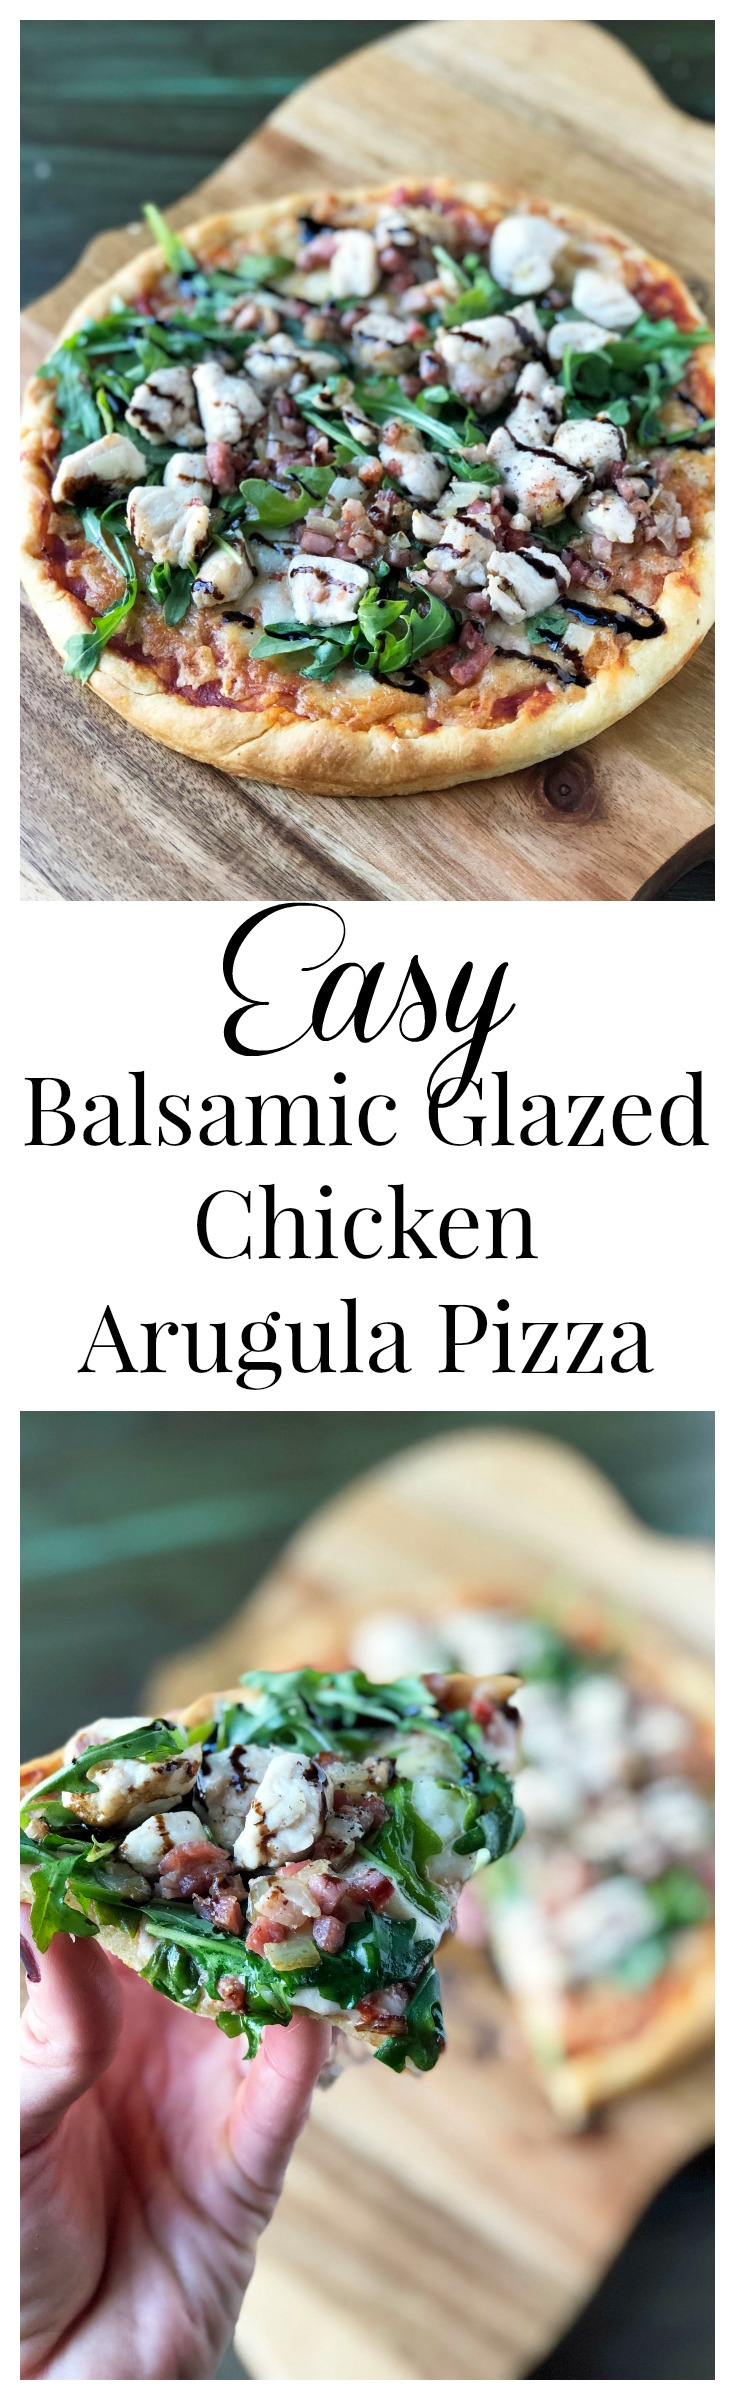 Easy Balsamic Glazed Chicken Arugula Pizza